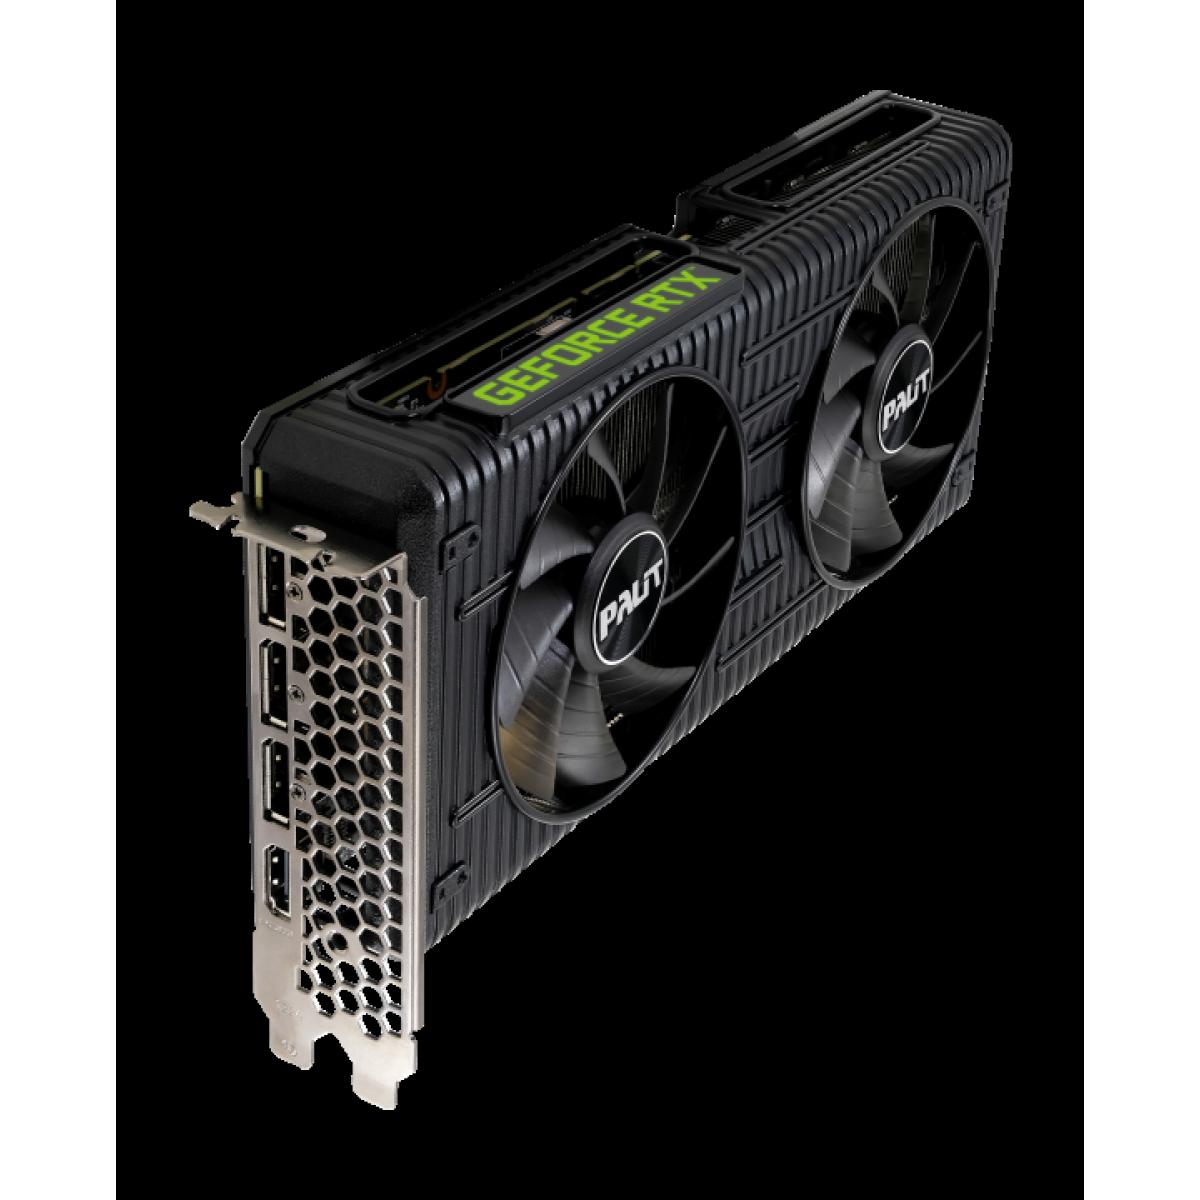 Placa de Vídeo Palit NVIDIA GeForce RTX 3060 Dual OC, 12GB, GDDR6, 192bit, NE63060T19K9-190AD